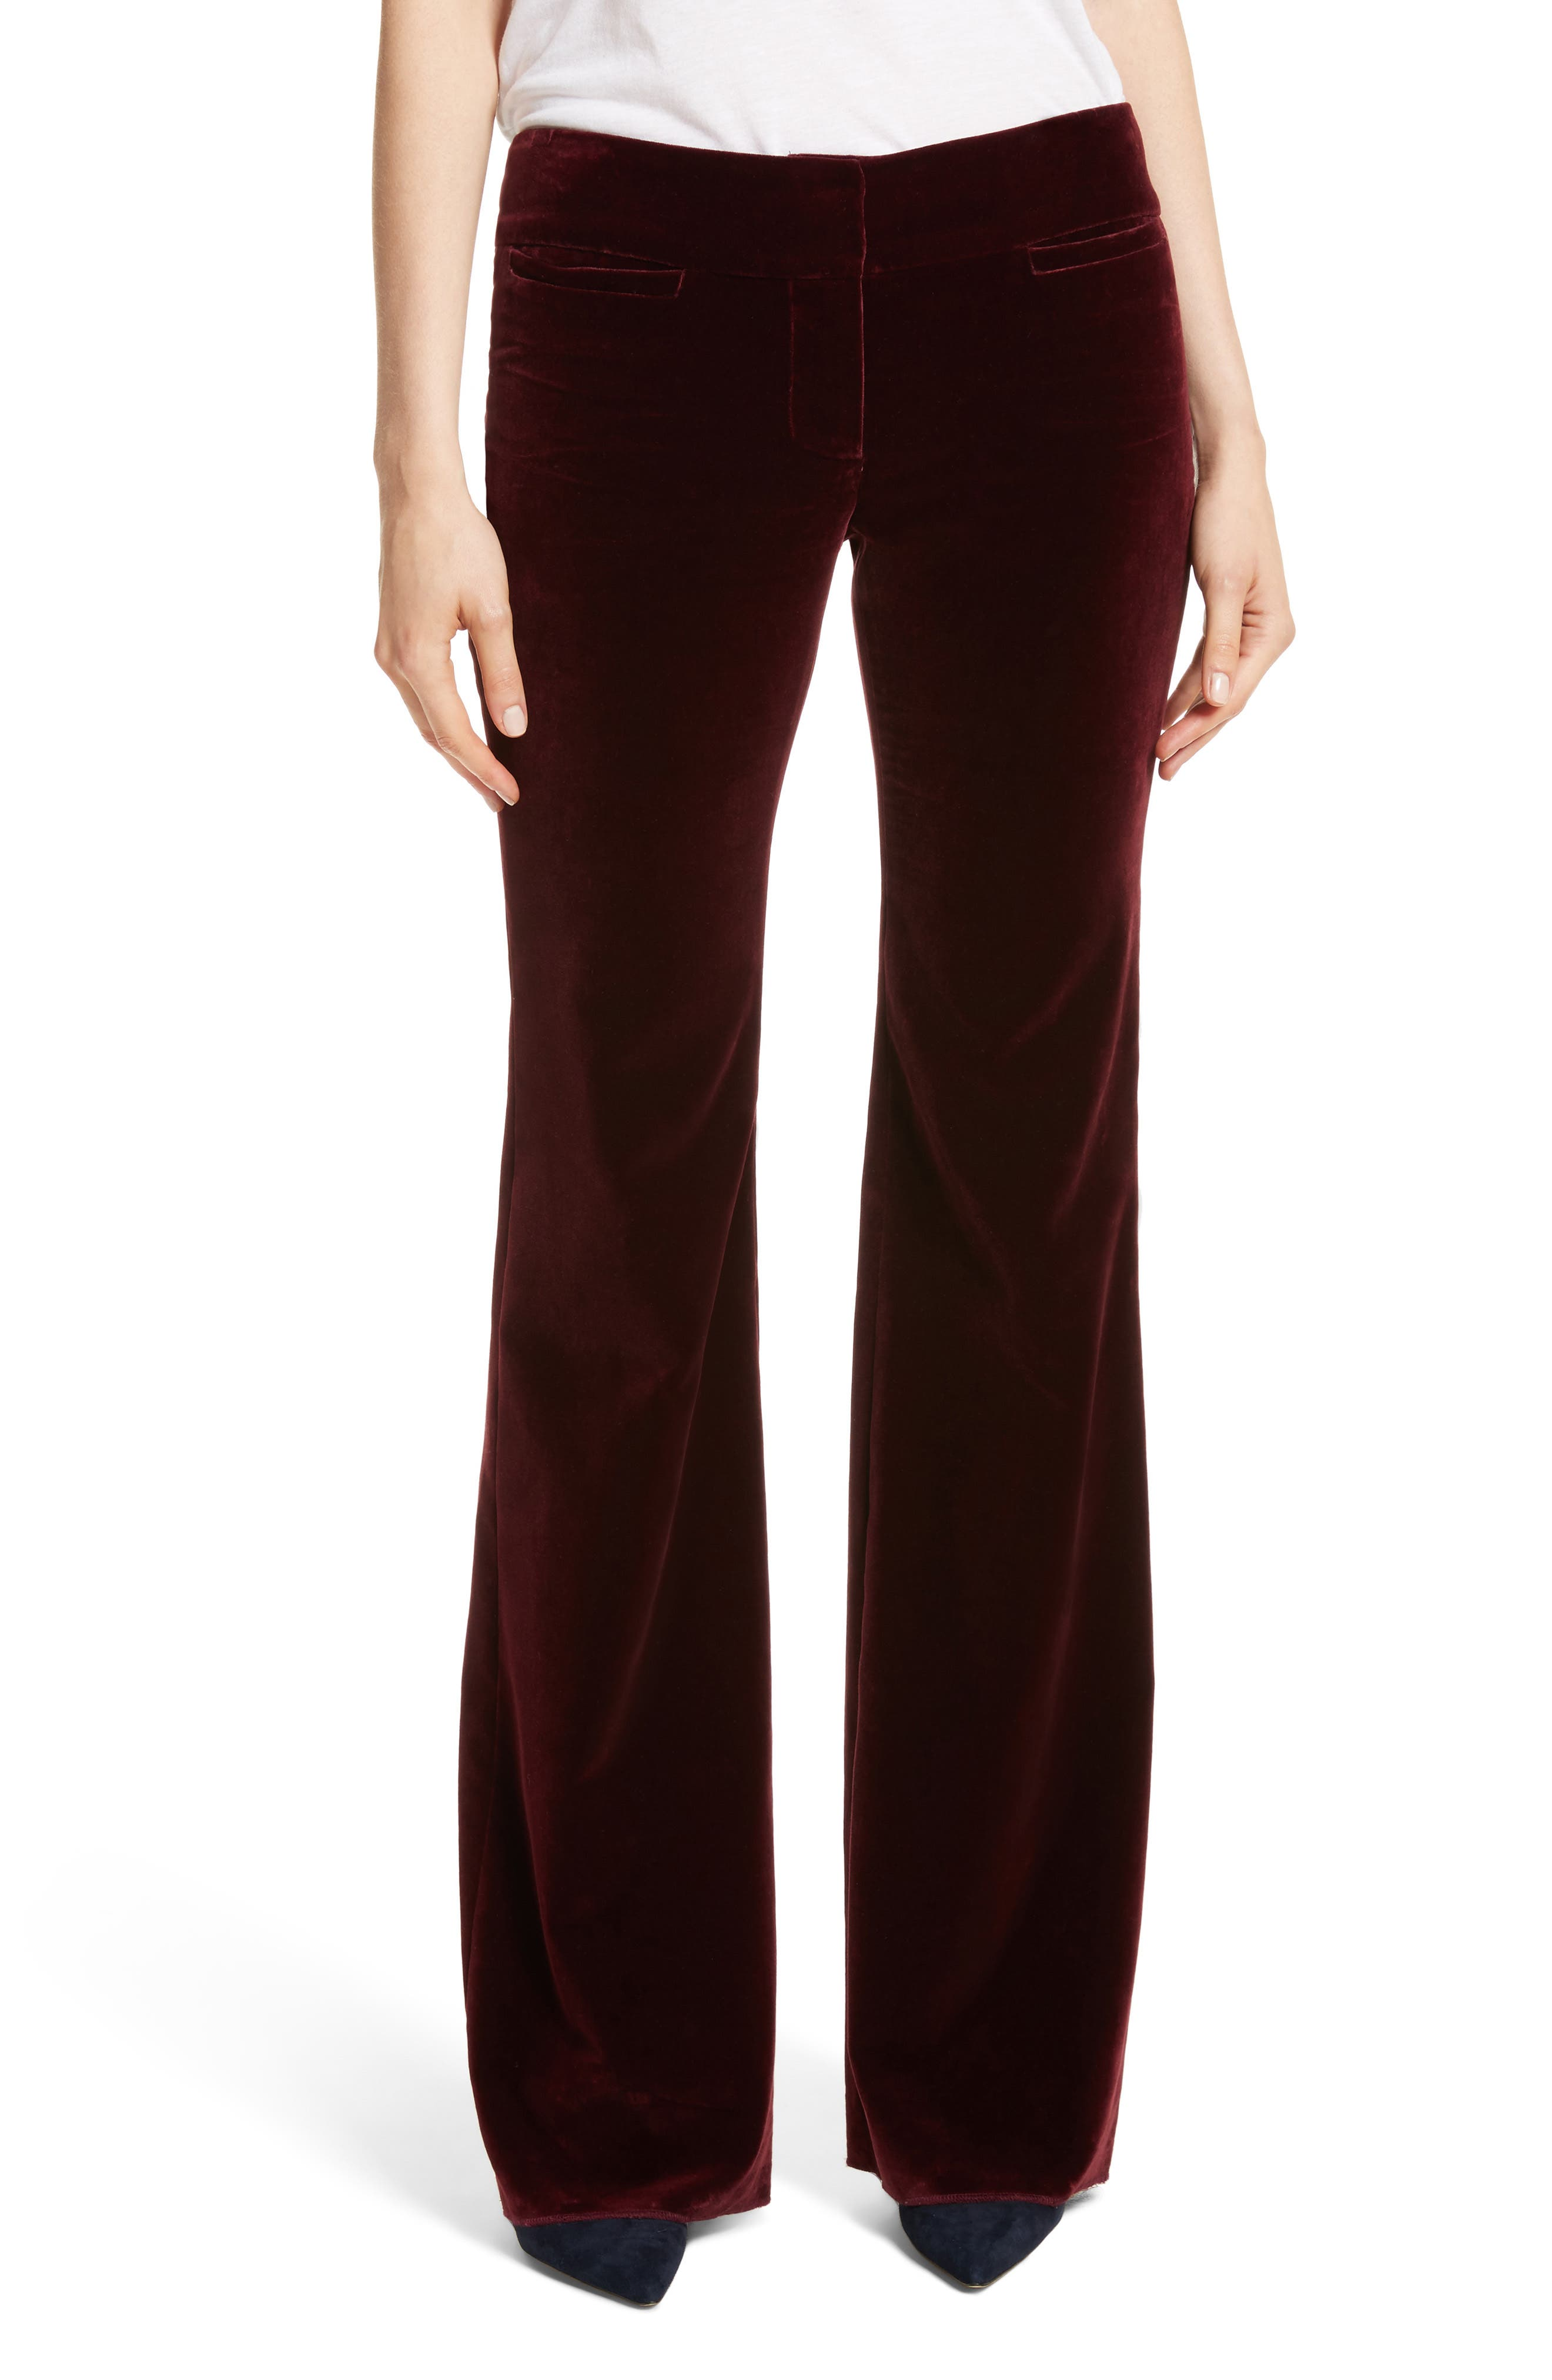 Nili Lotan Amoire Velvet Flare Pants